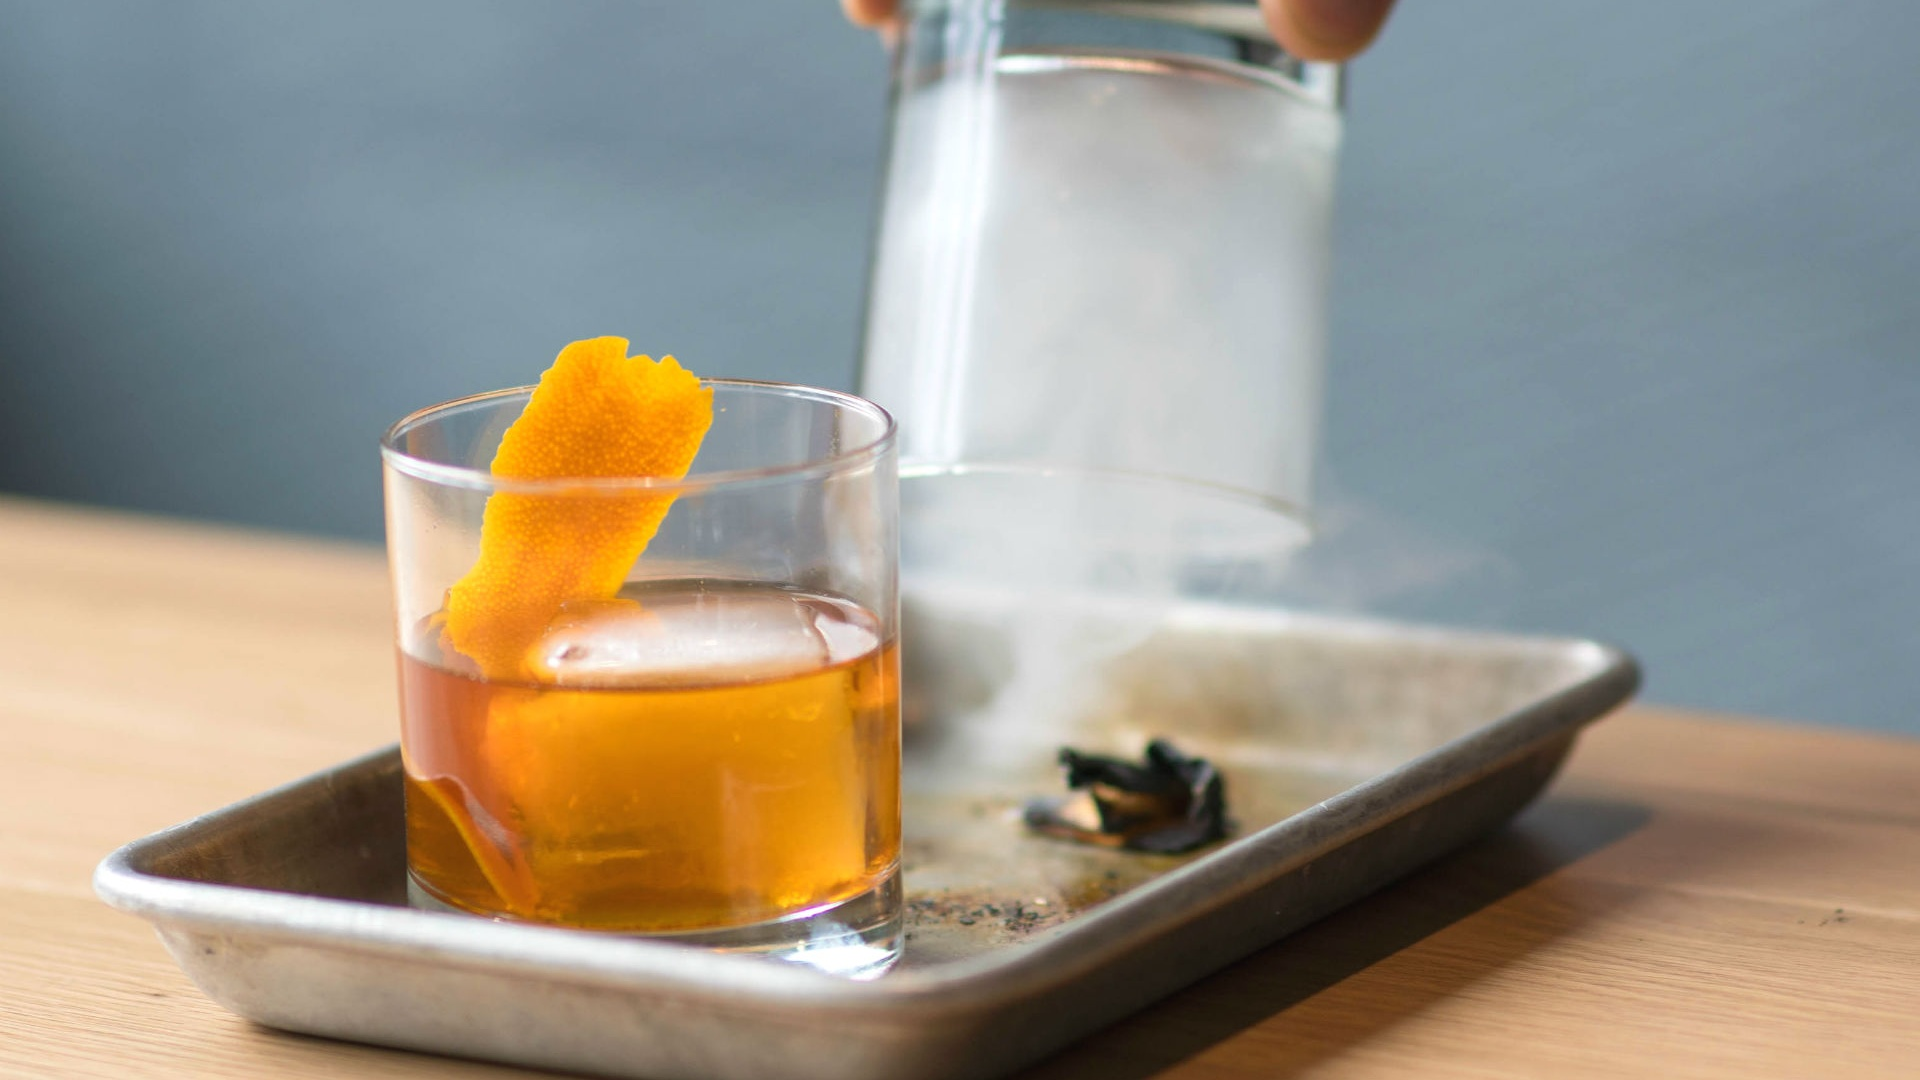 make-this-northern-maverick-smoked-old-fashioned